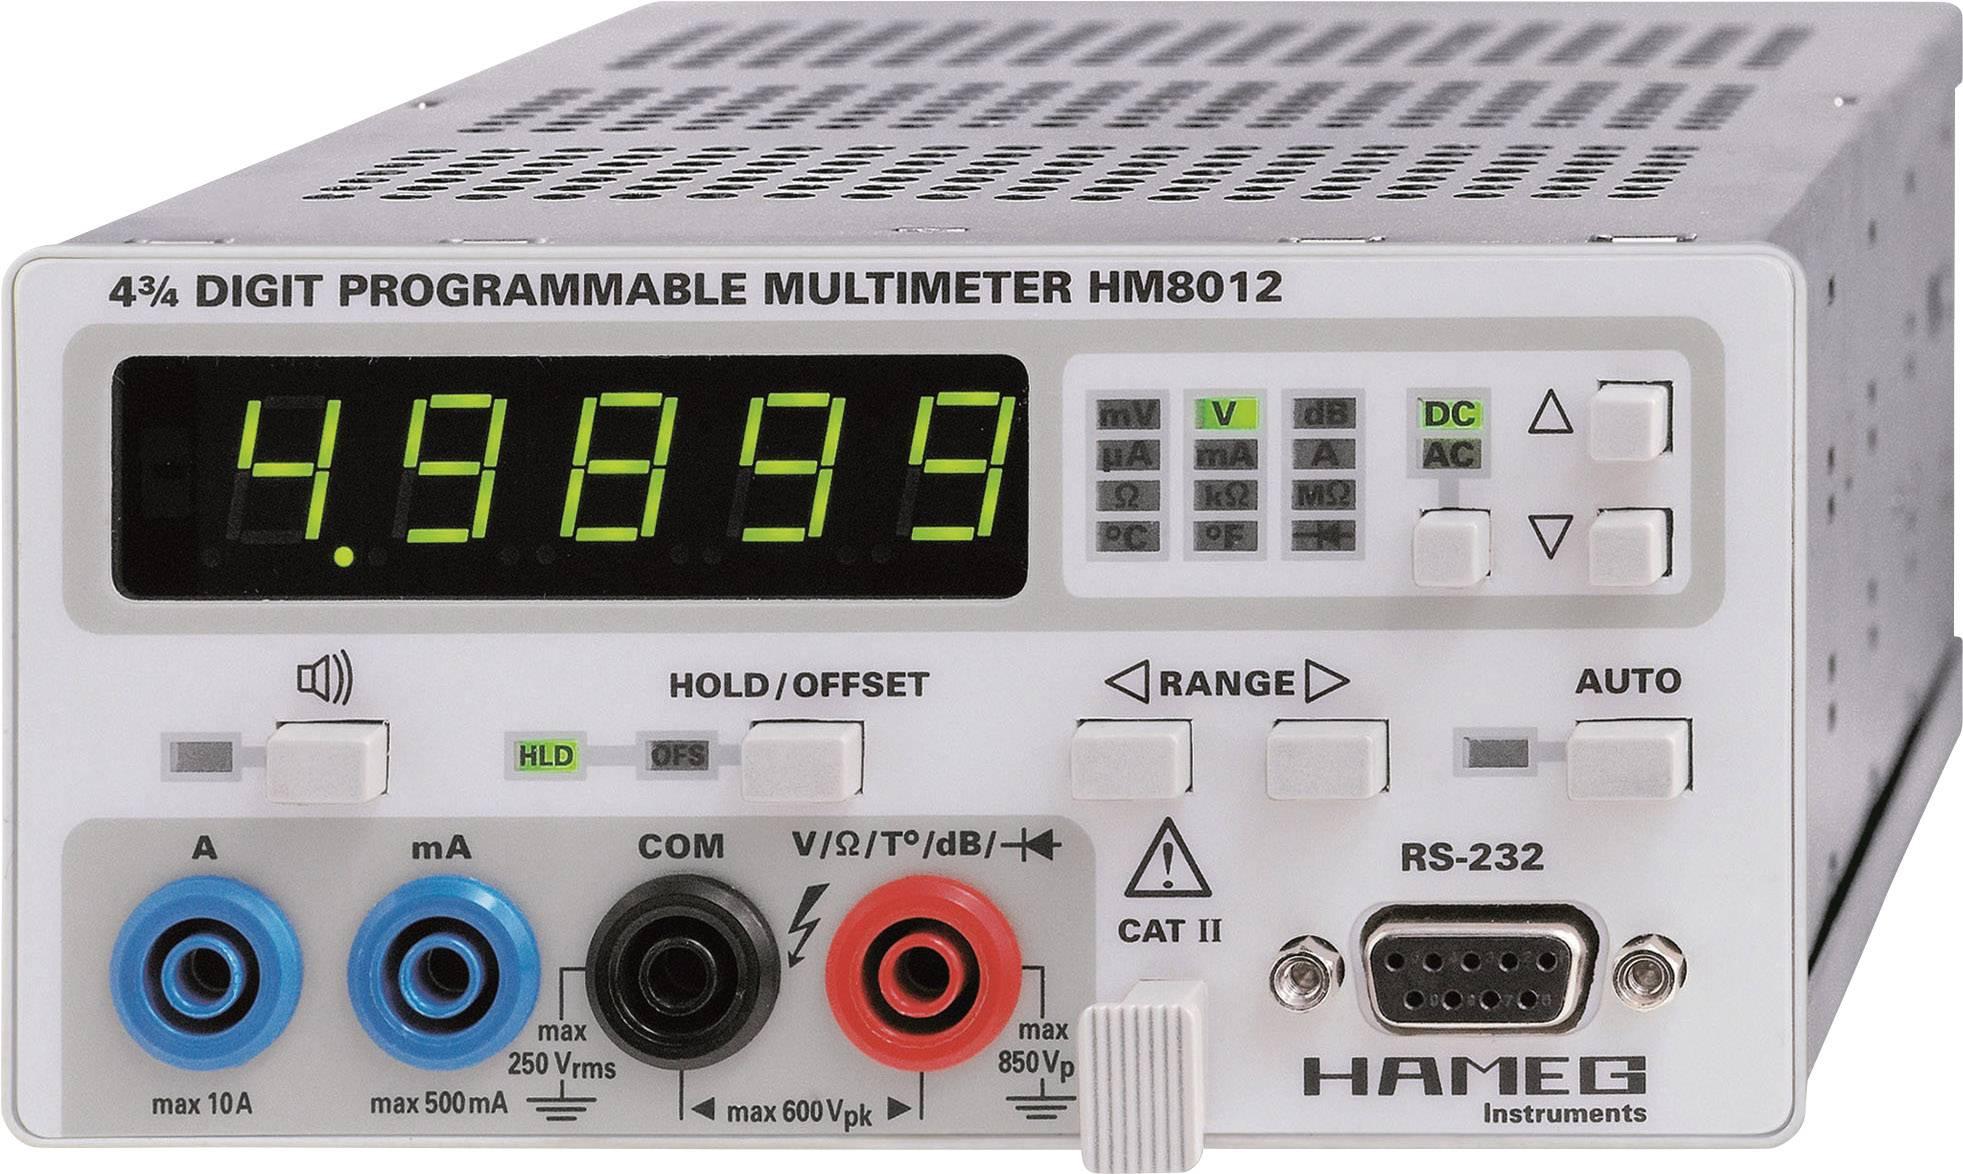 Digitálne/y stolný multimeter Rohde & Schwarz HM8012 3593.0768K02